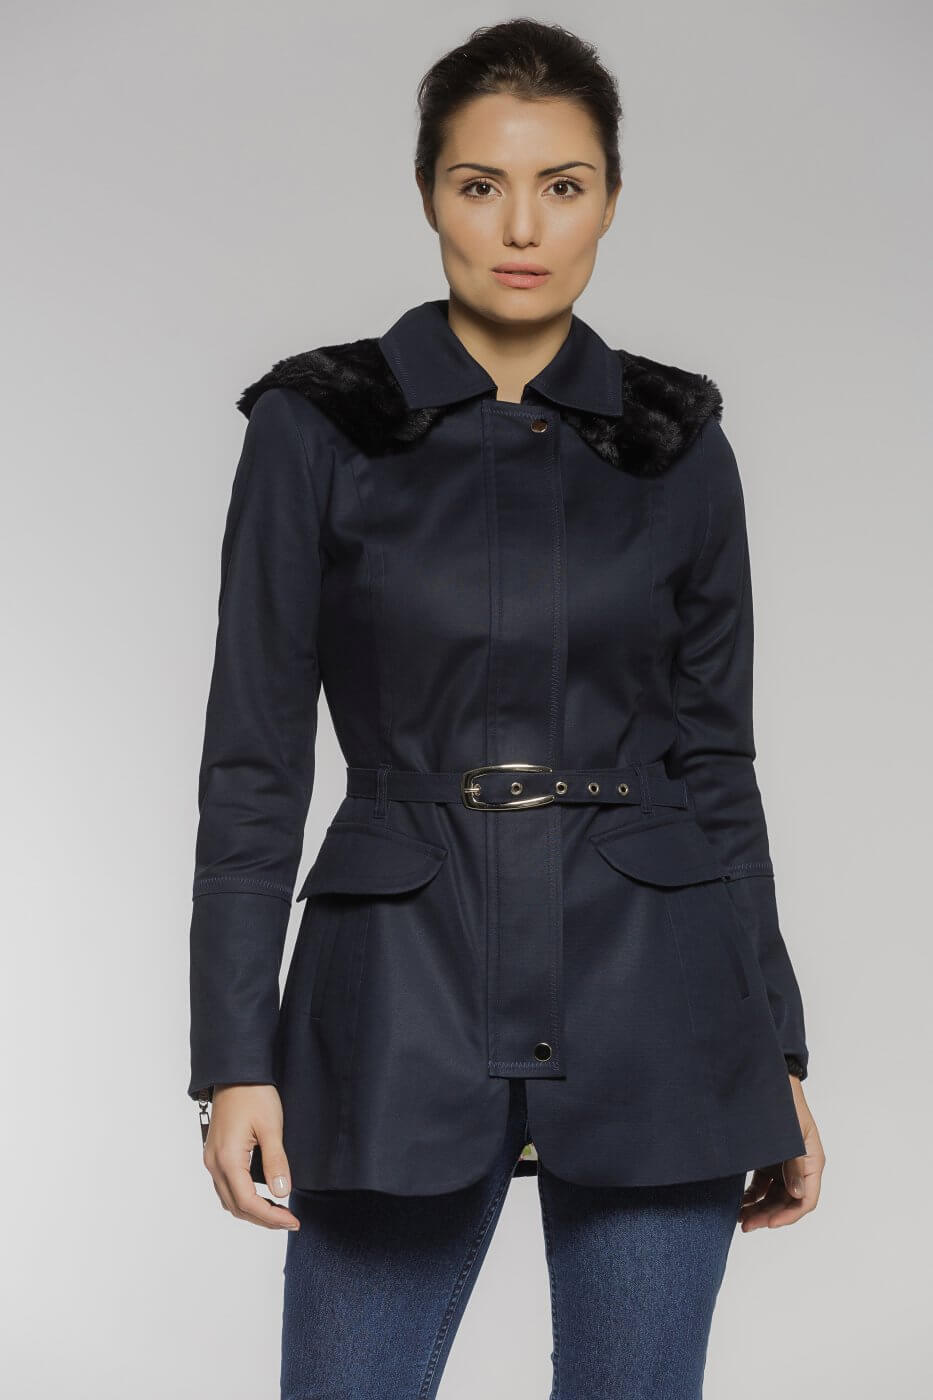 Trench Coat Sarja com Capuz Azul Marinho